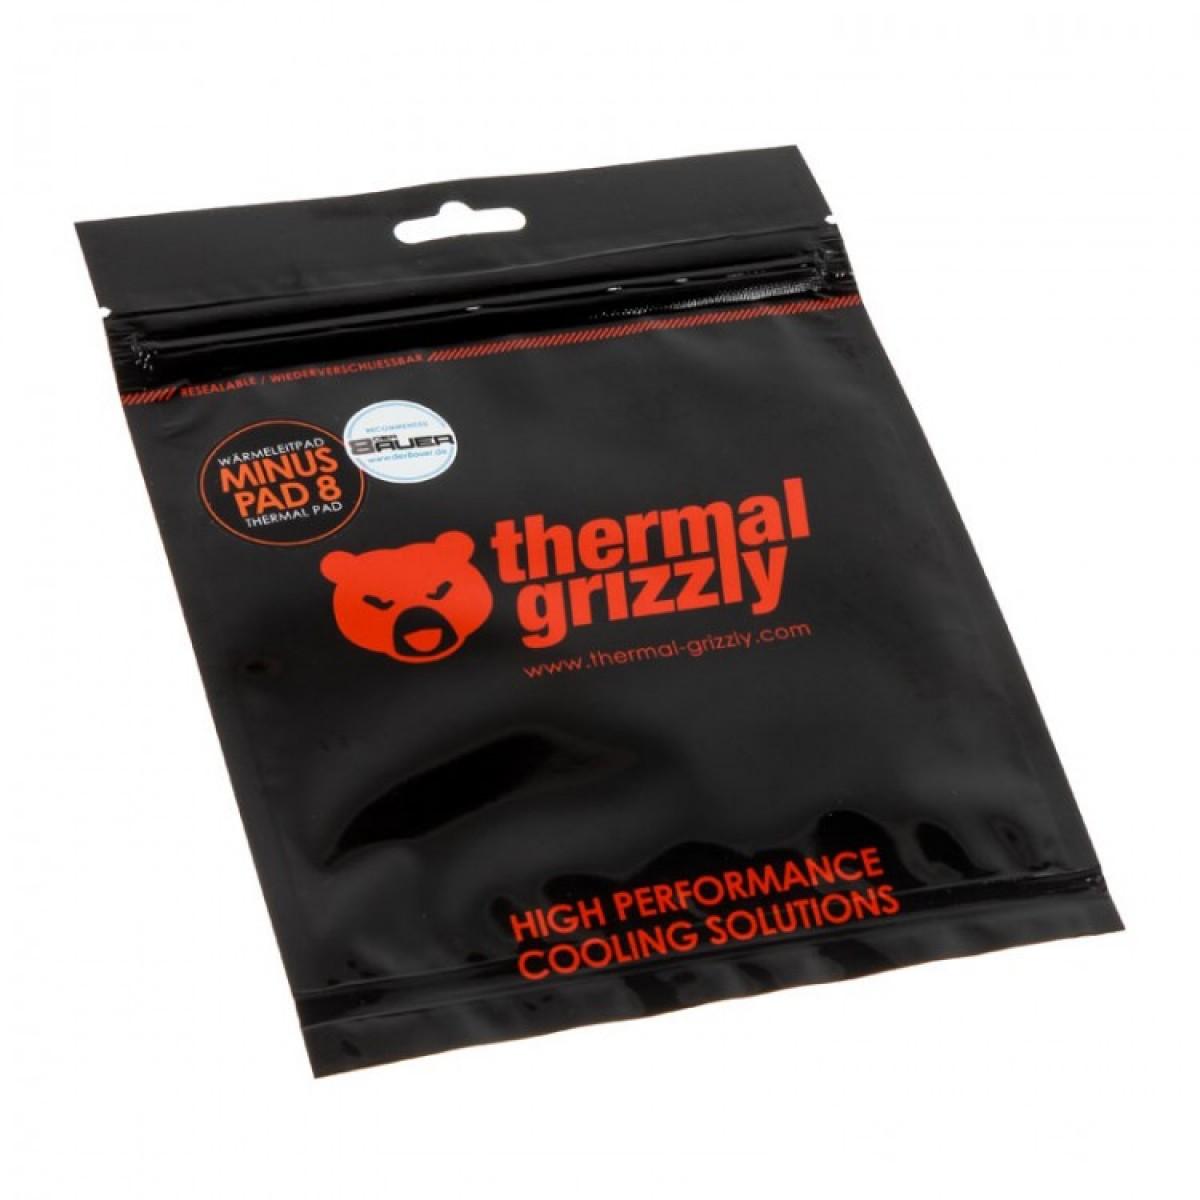 Pad Térmico Thermal Grizzly Minus Pad 8, 120 x 20 x 1 mm, TG-MP8-120-20-10-2R